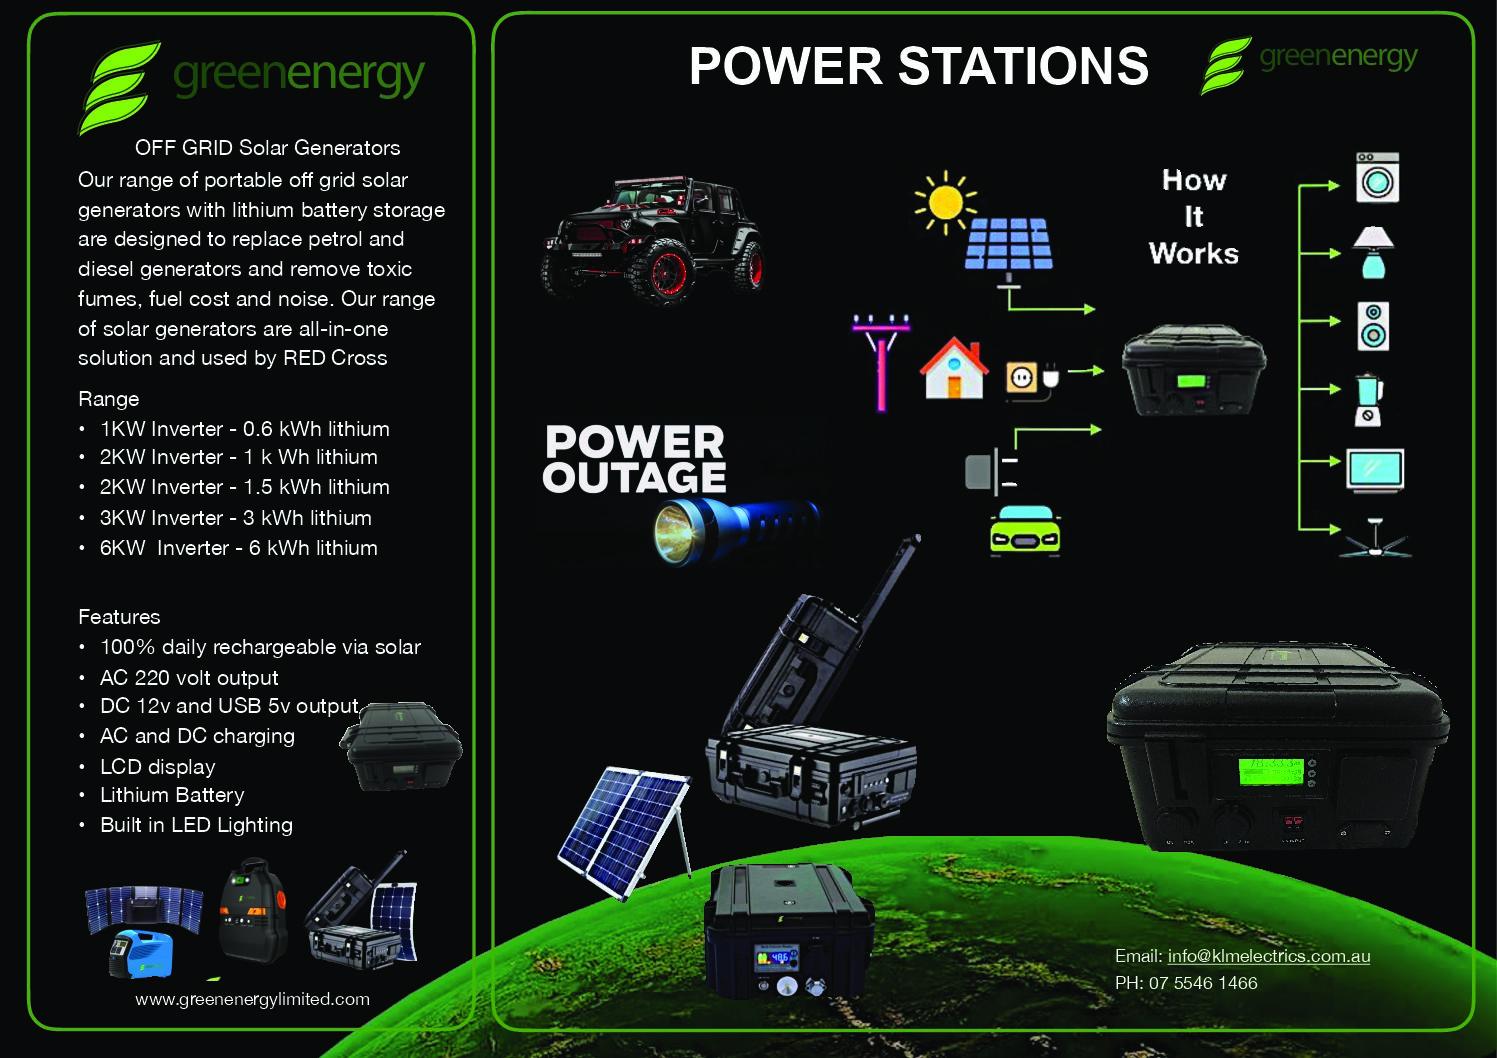 Off Grid Solar Generators 1-2KW 90AH Lithium Battery